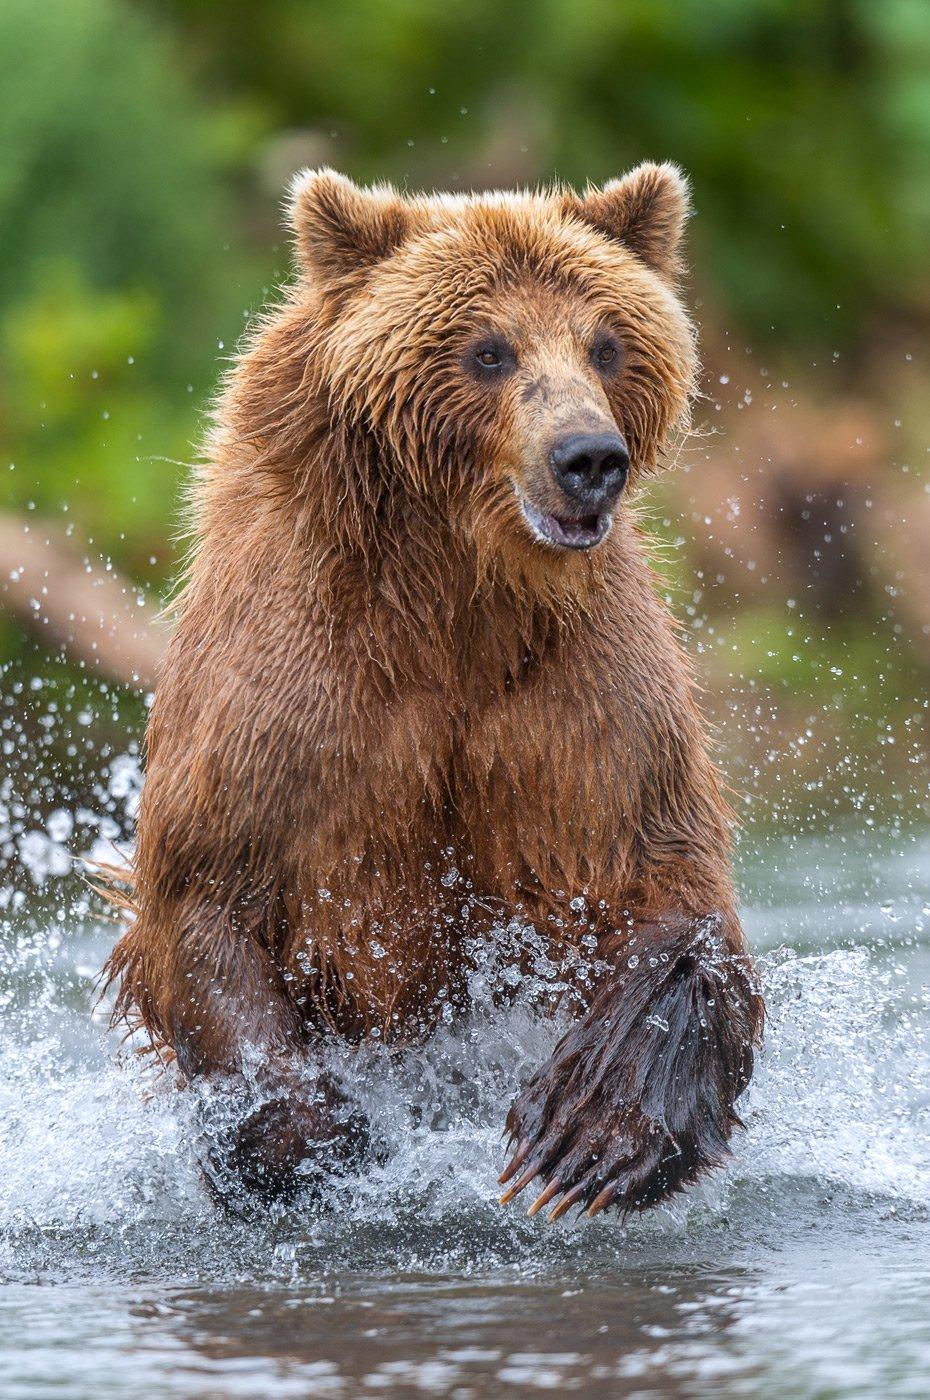 камчатка, бурый медведь, Сергей Иванов